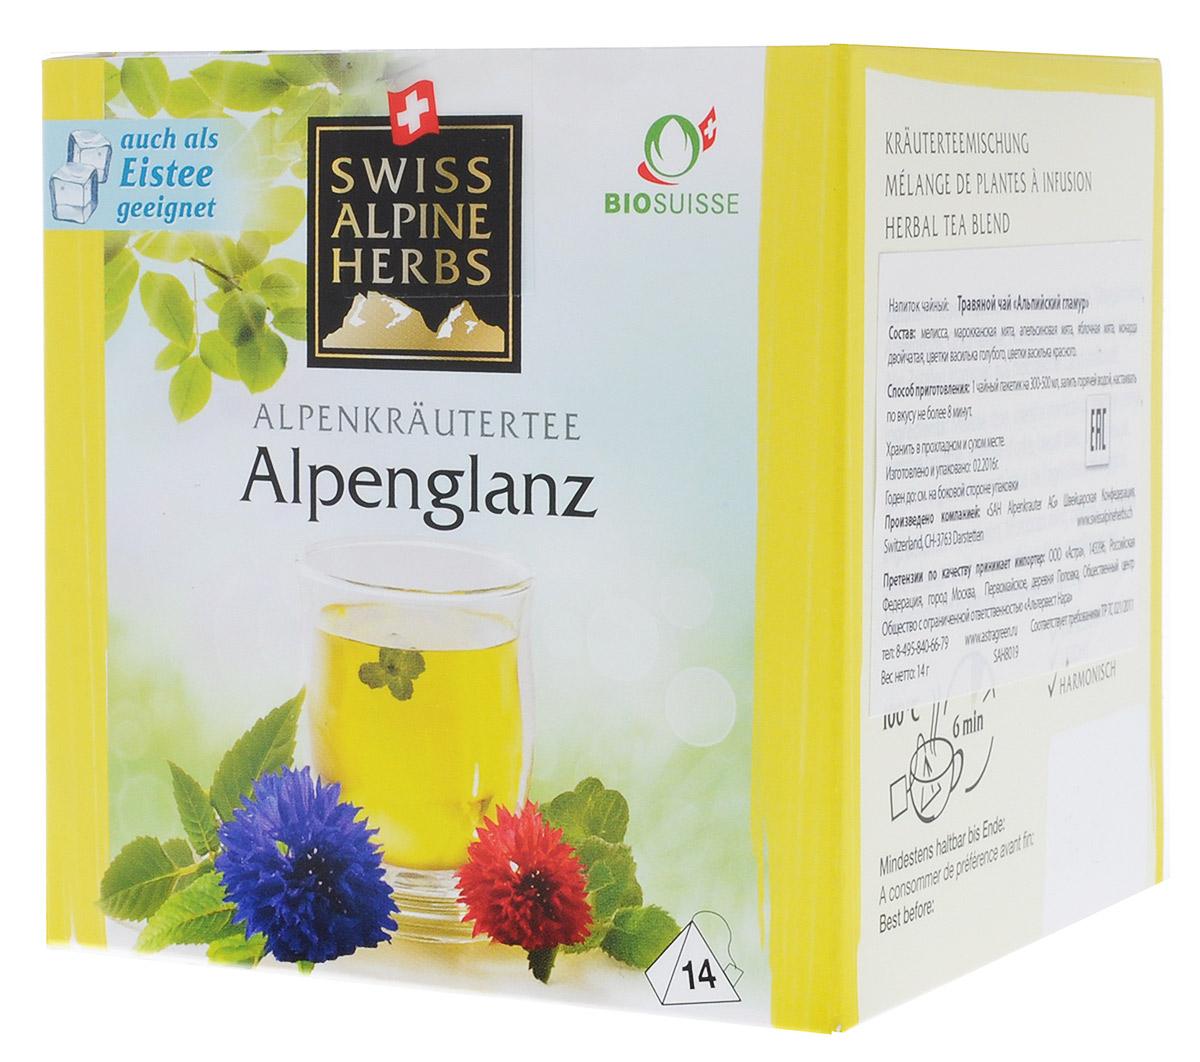 Swiss Alpine Herbs Альпийский гламур травяной чай в пакетиках, 14 шт чай swiss alpin herbs травяной альпийский гламур 14 пакетиков для чайника